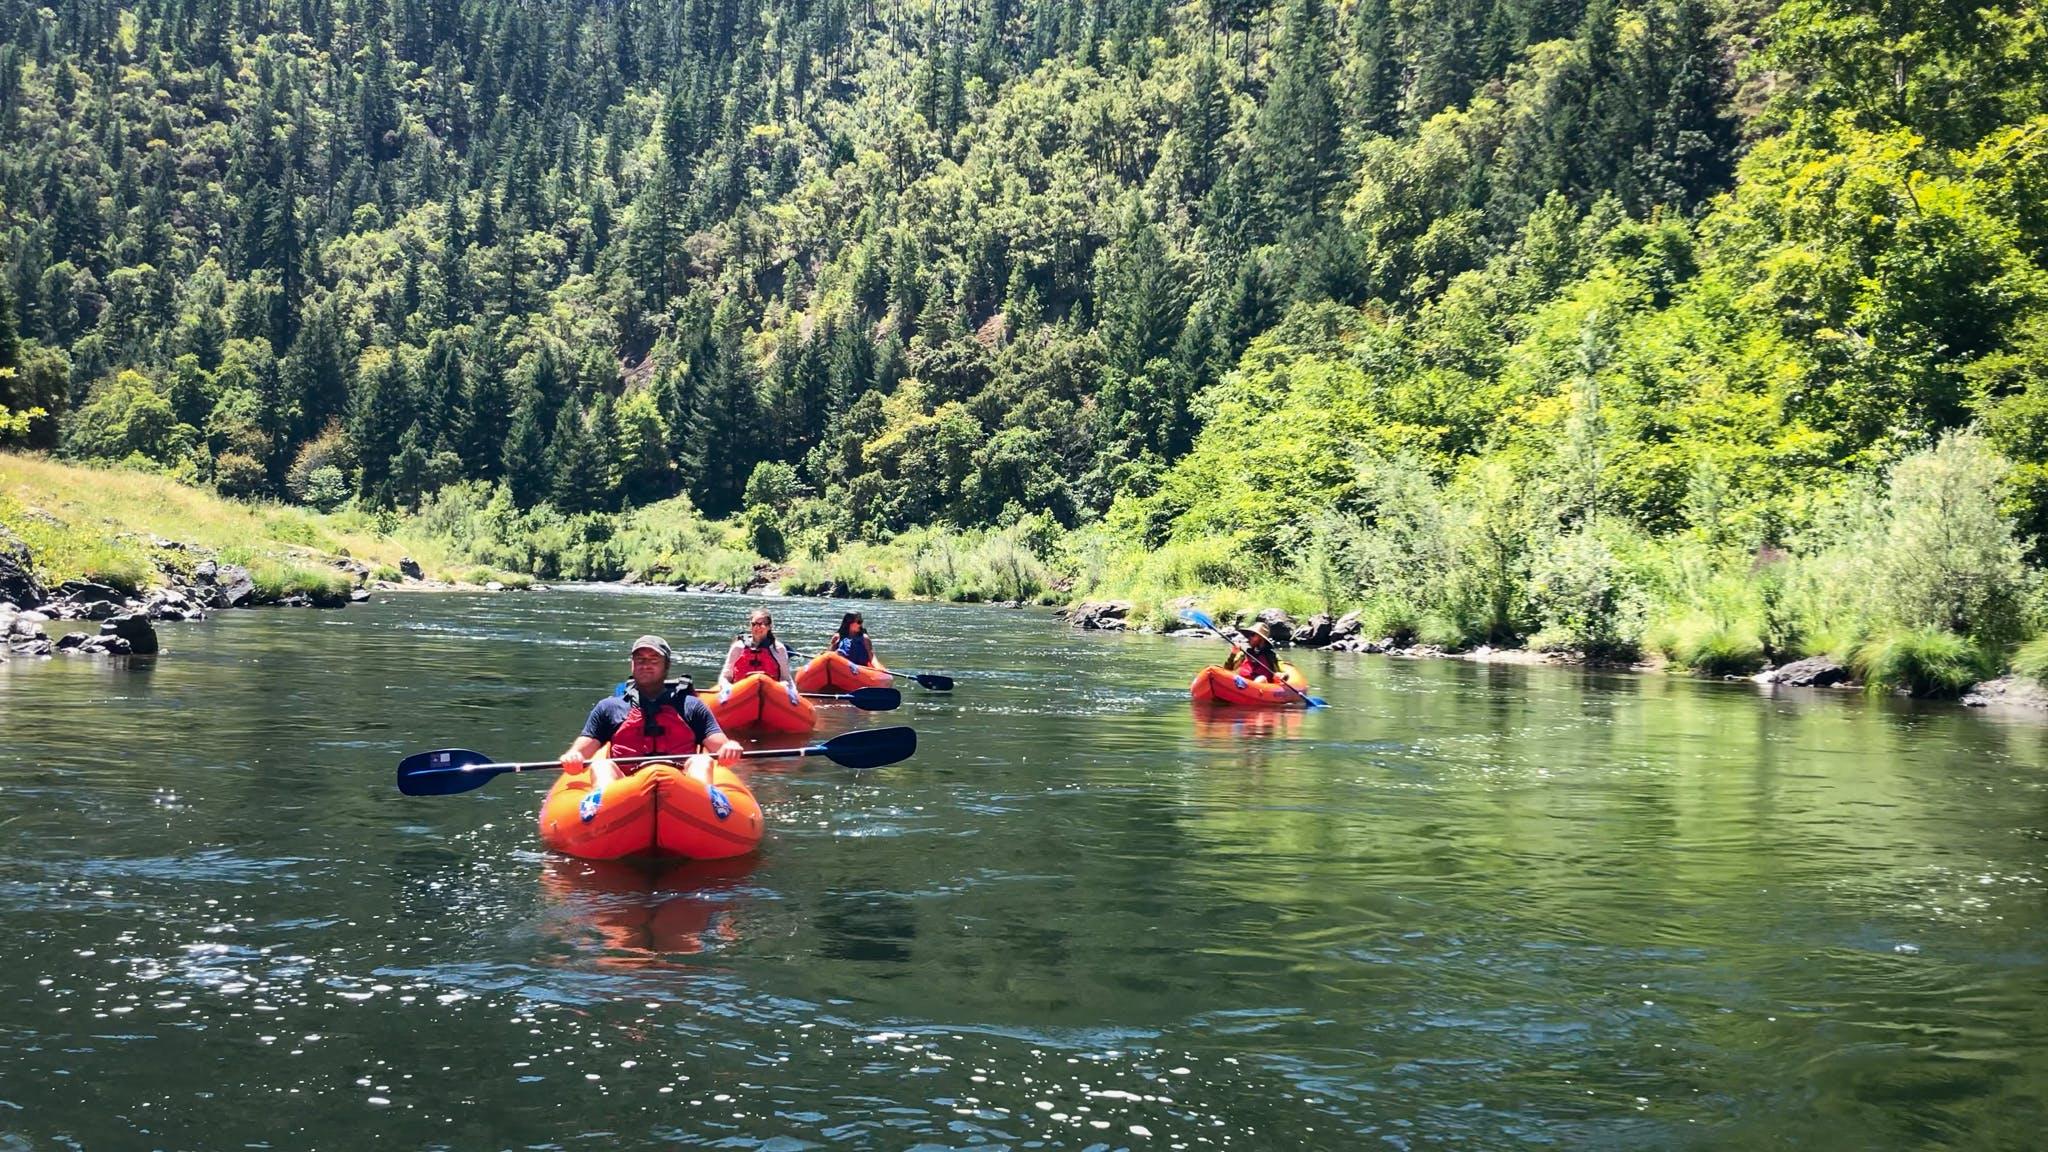 Inflatable kayak orange torpedo Rogue River